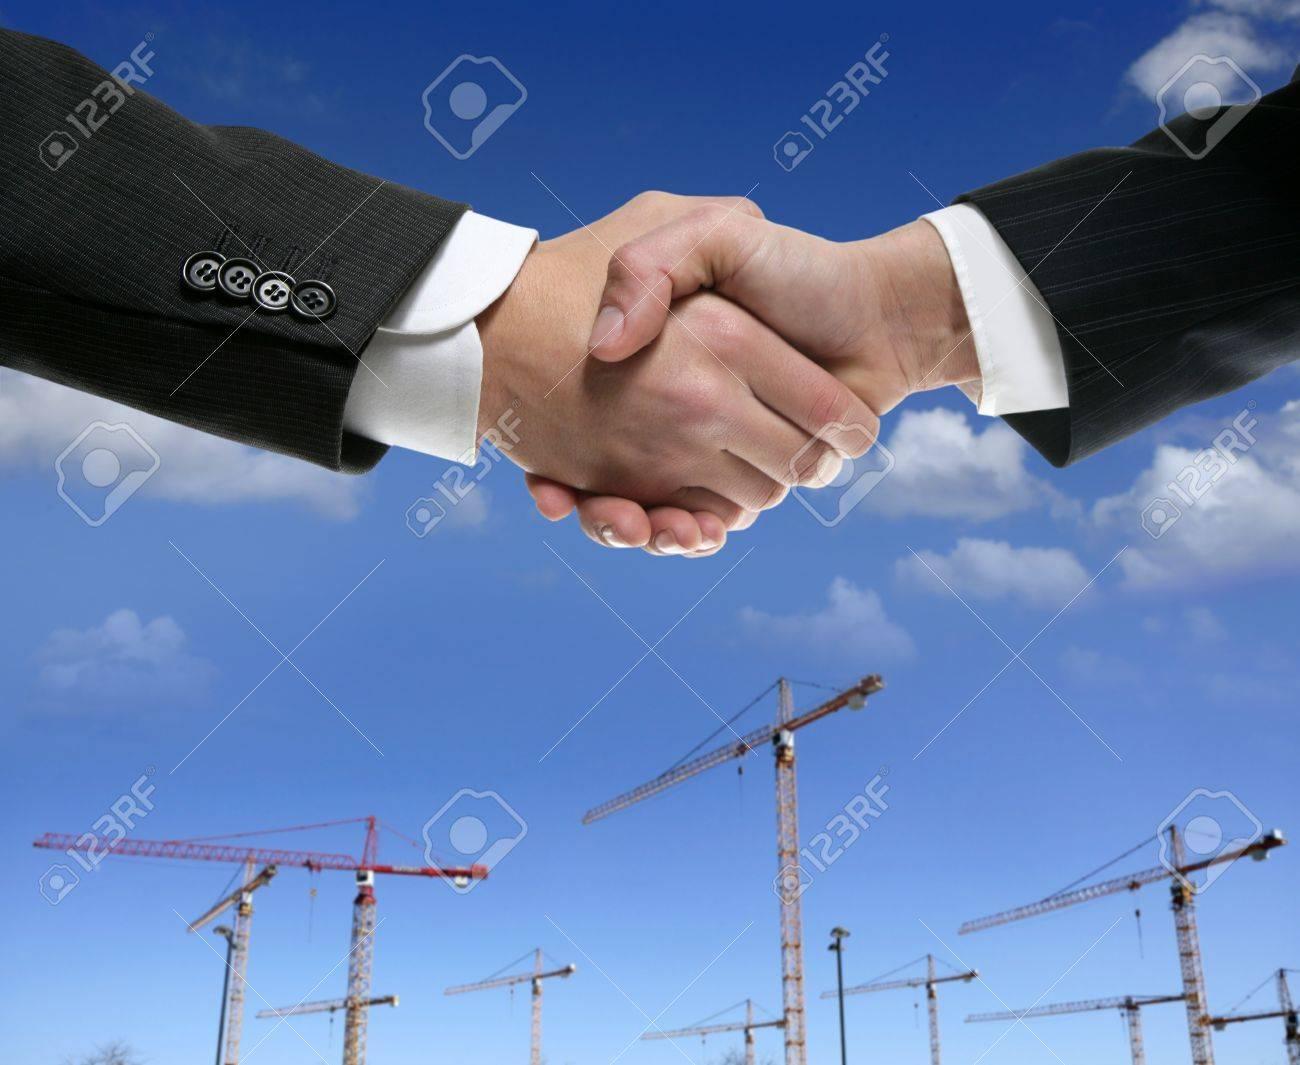 Businessmn handshake in construction crane area over blue sky Stock Photo - 4484363